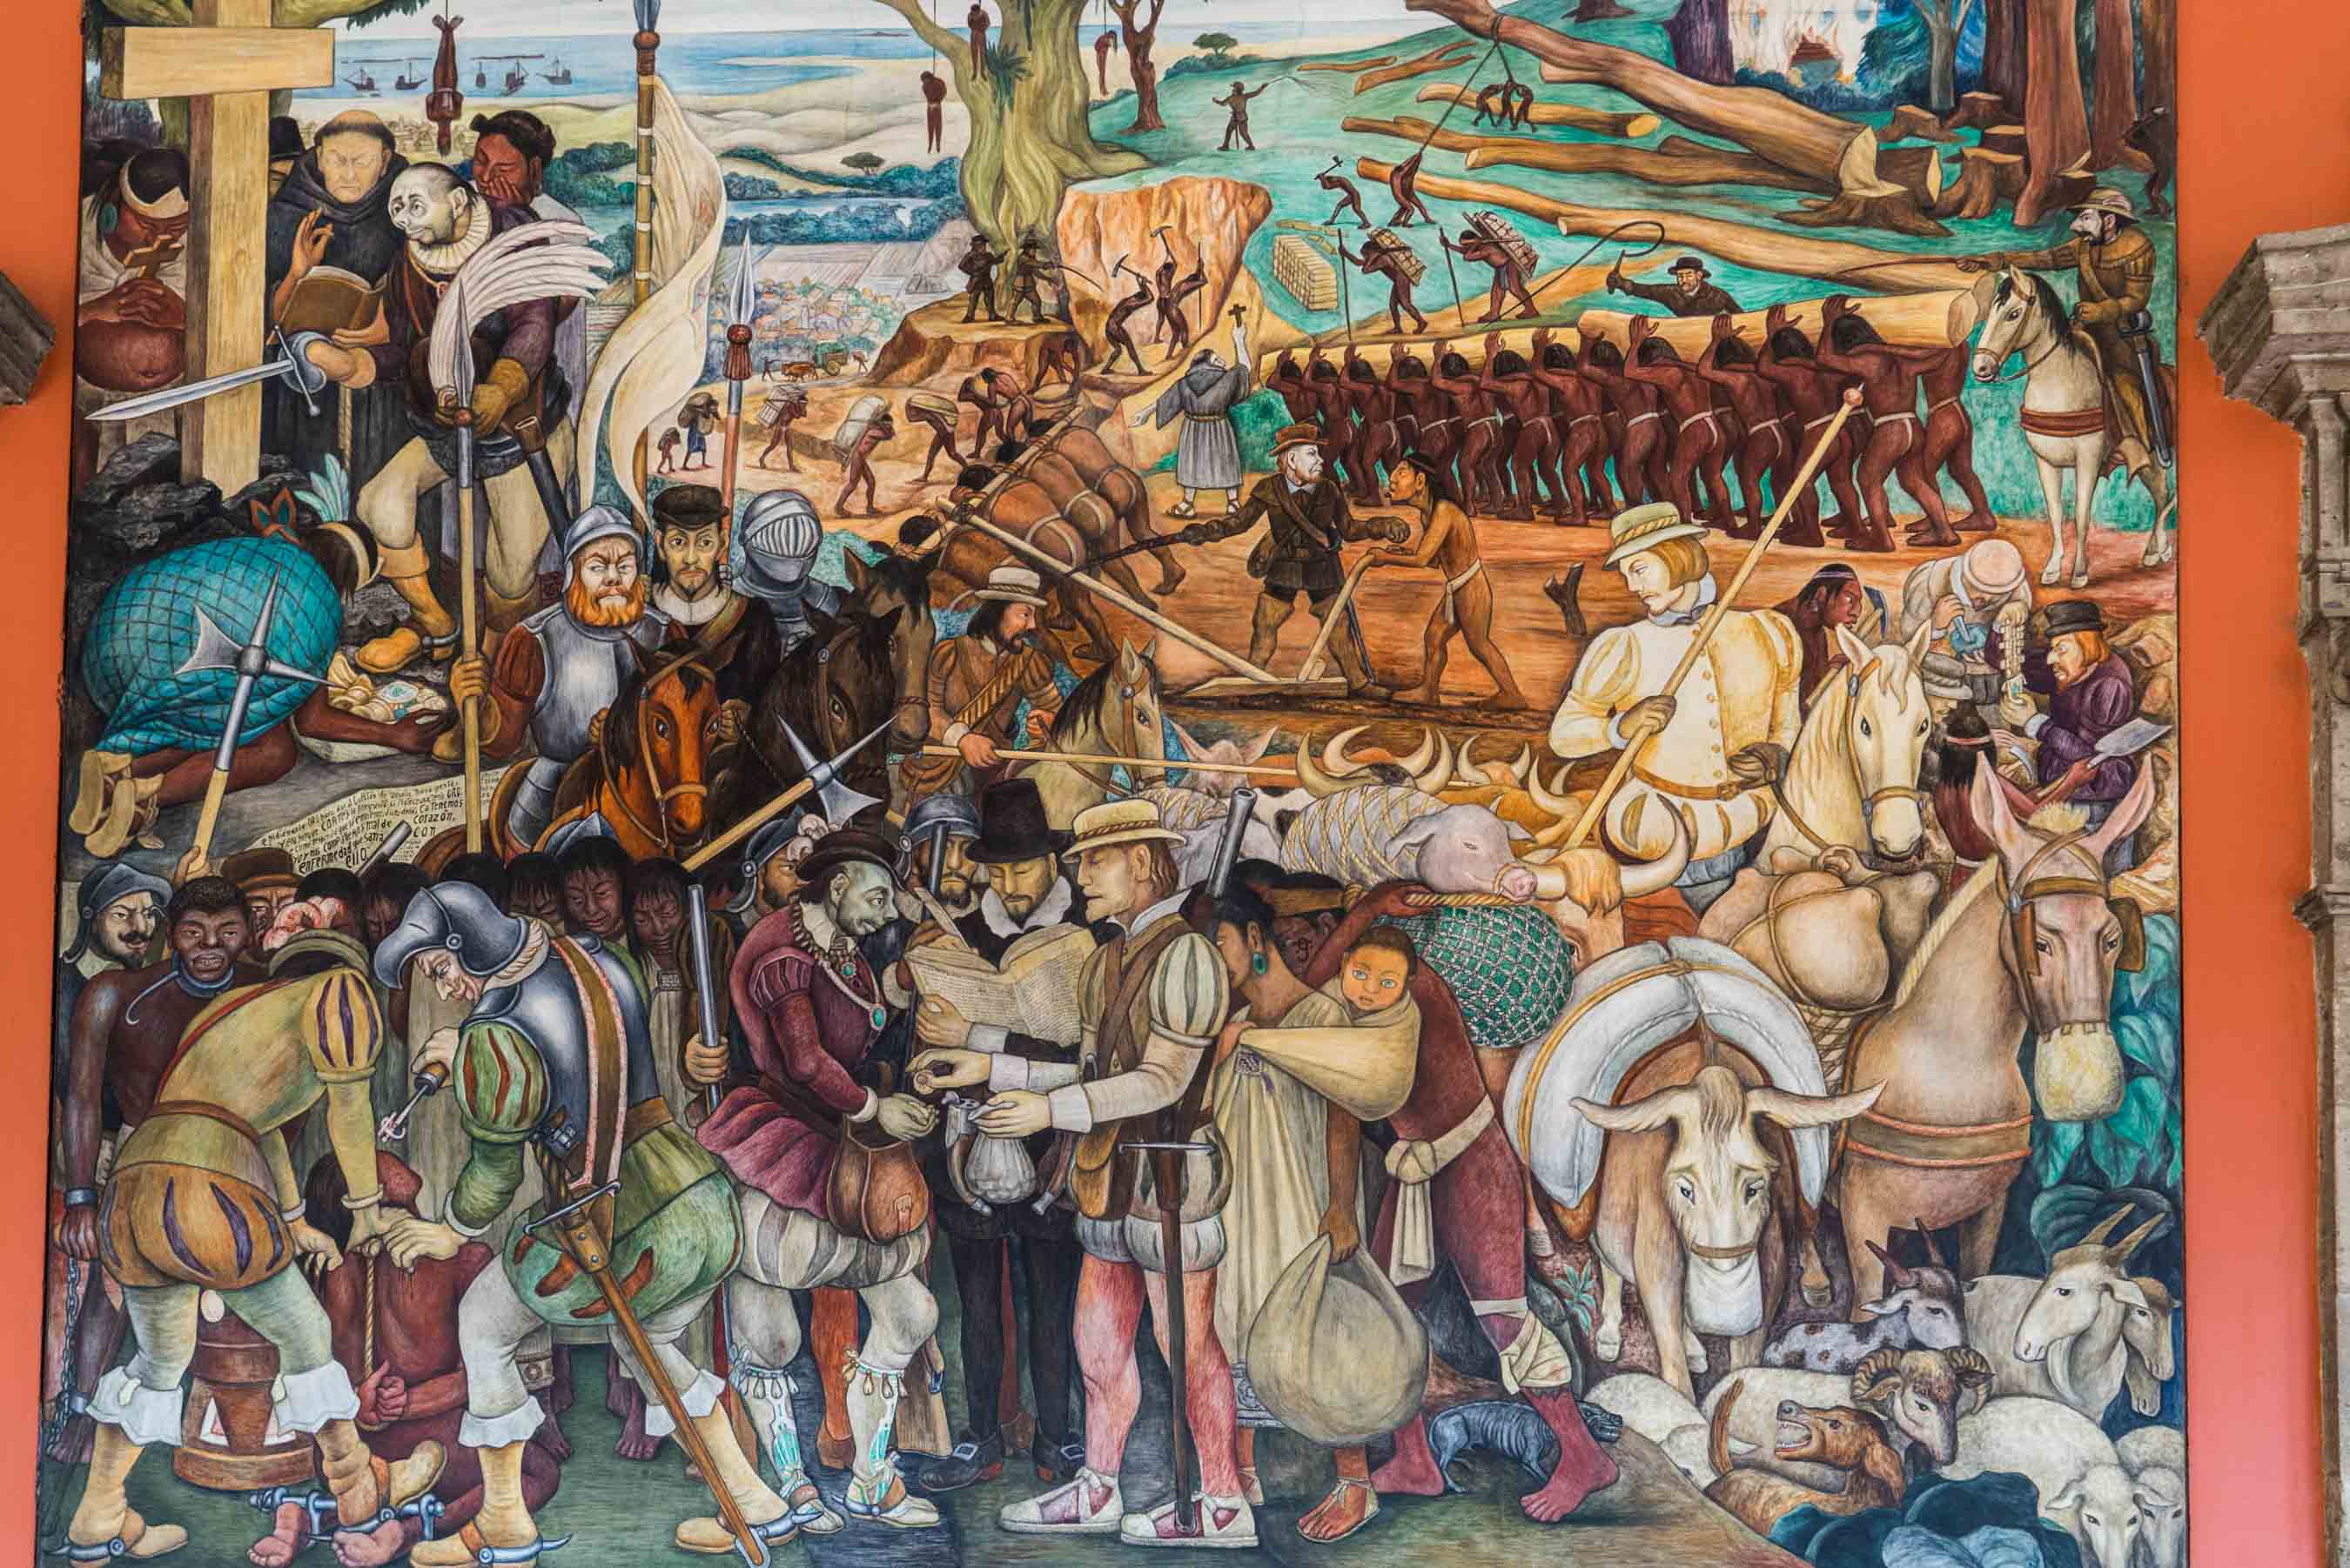 Palacio Nacional Diego Rivera mural Enrico Pescantini travel photographer 2